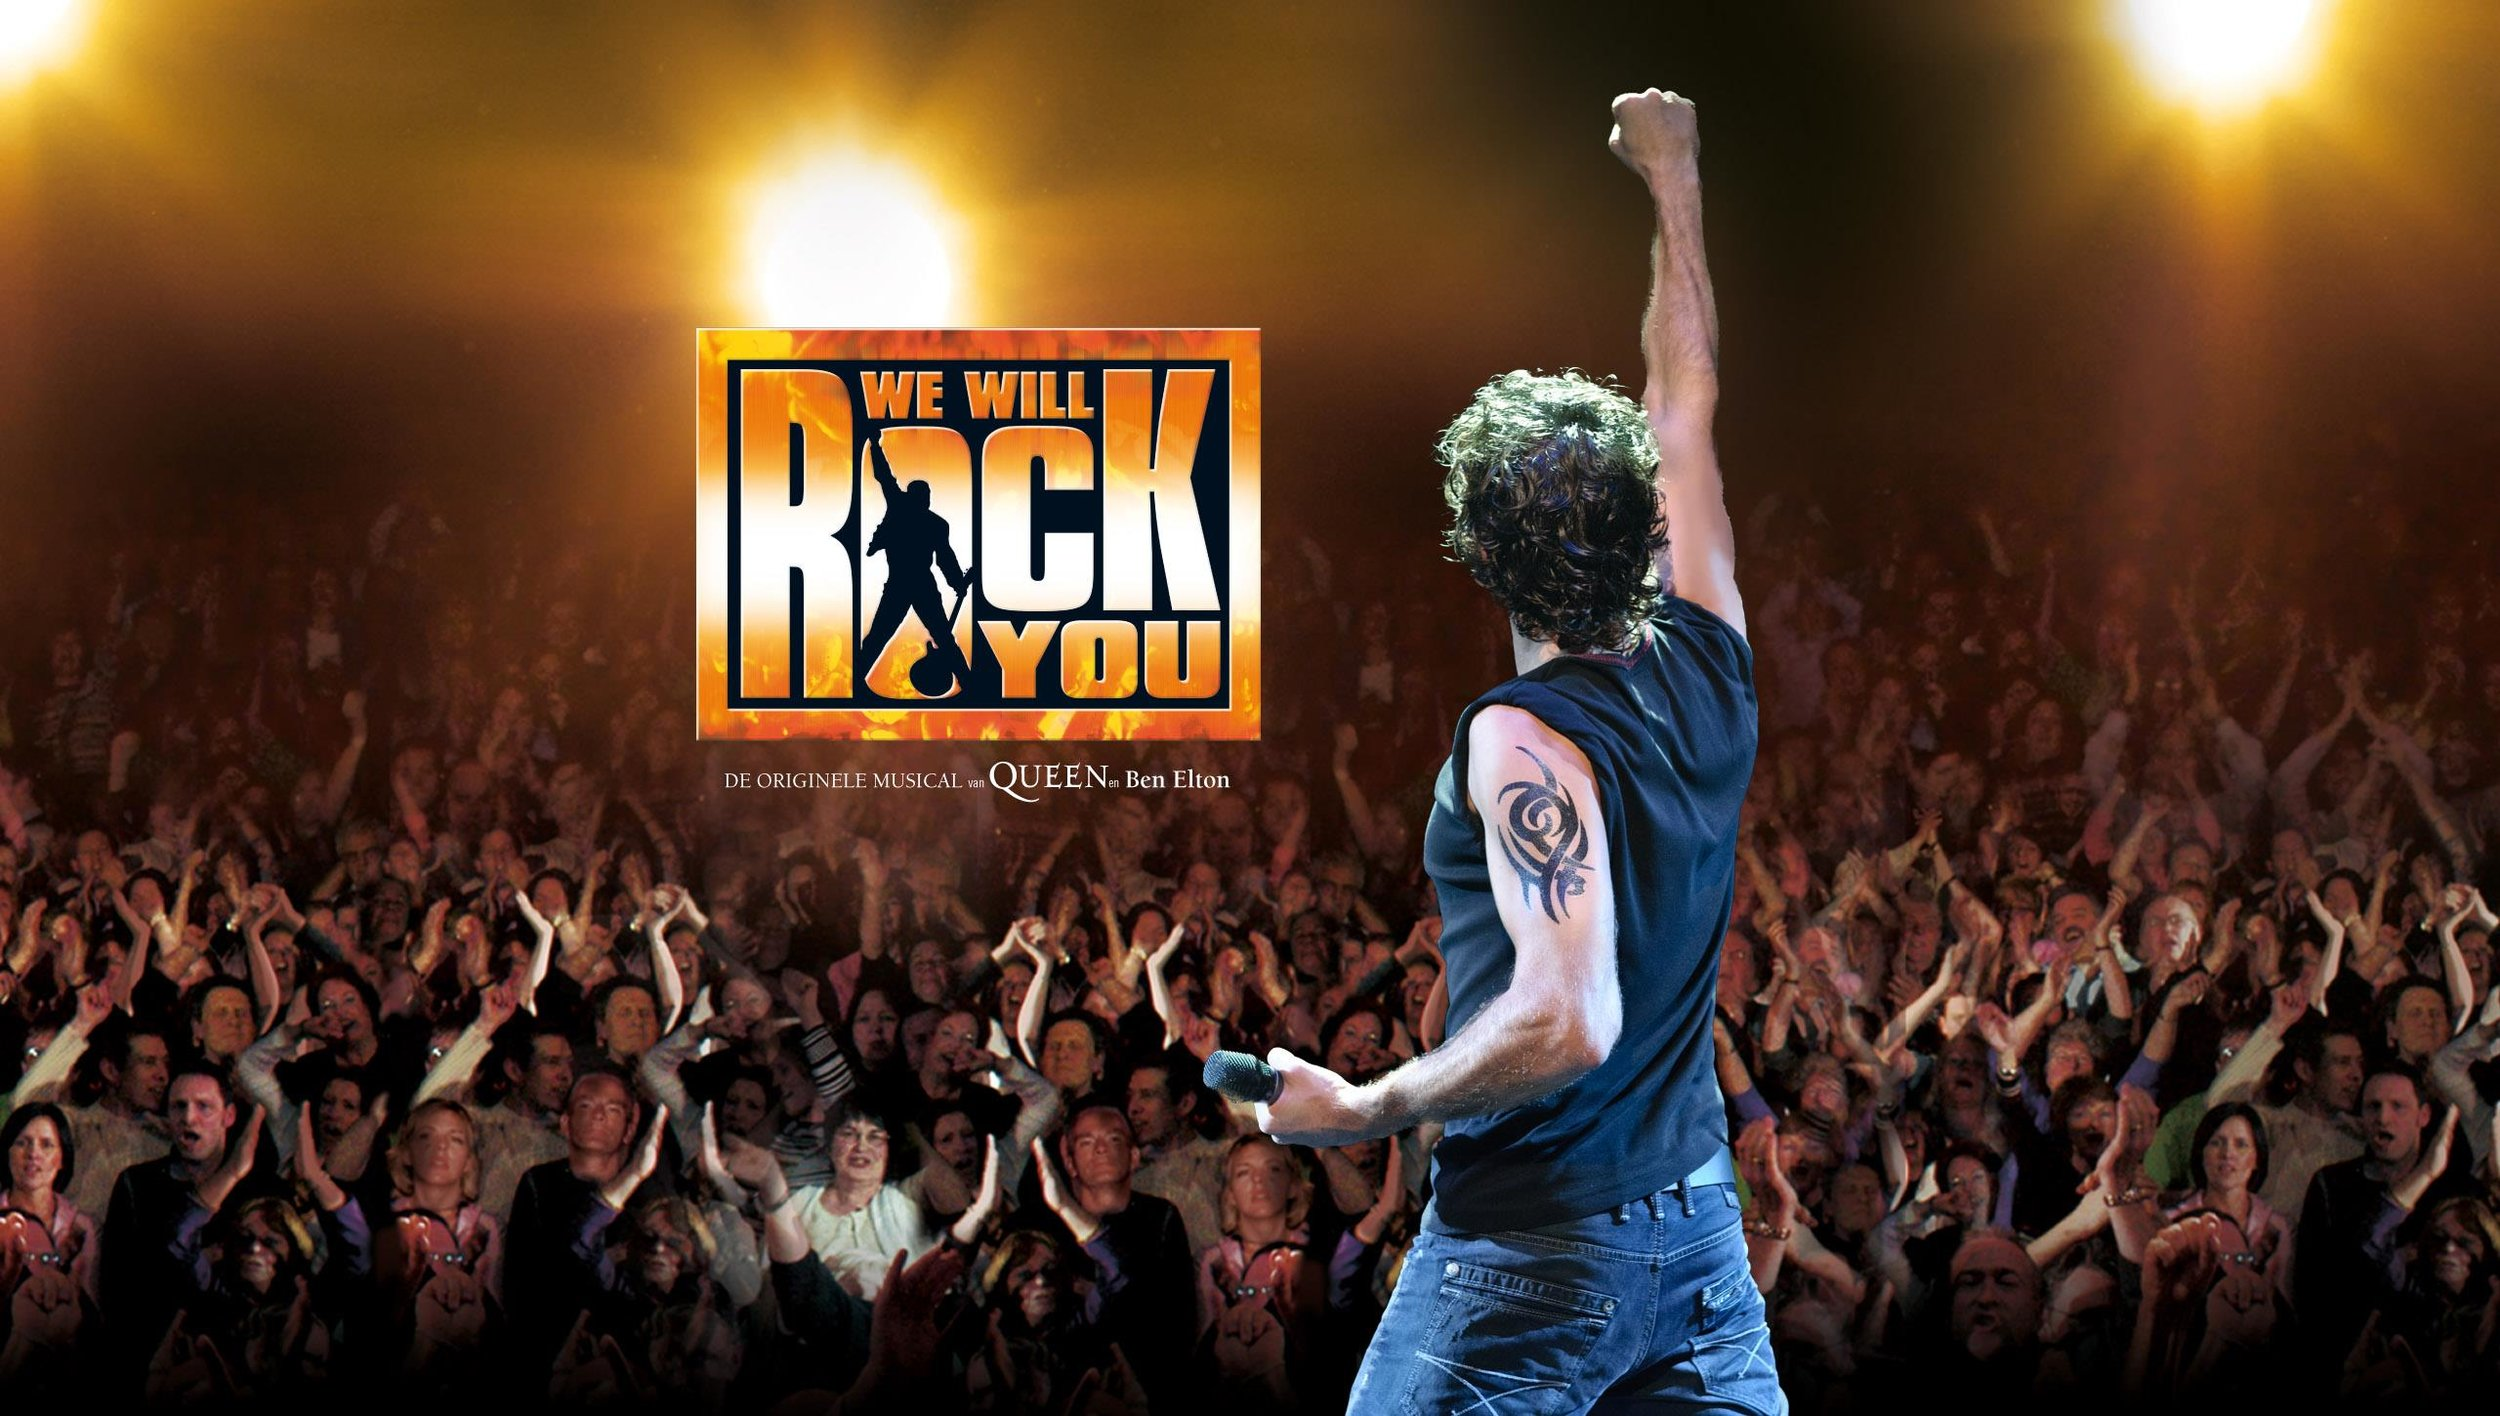 we_will_rock_you-musical-2010-header.jpeg